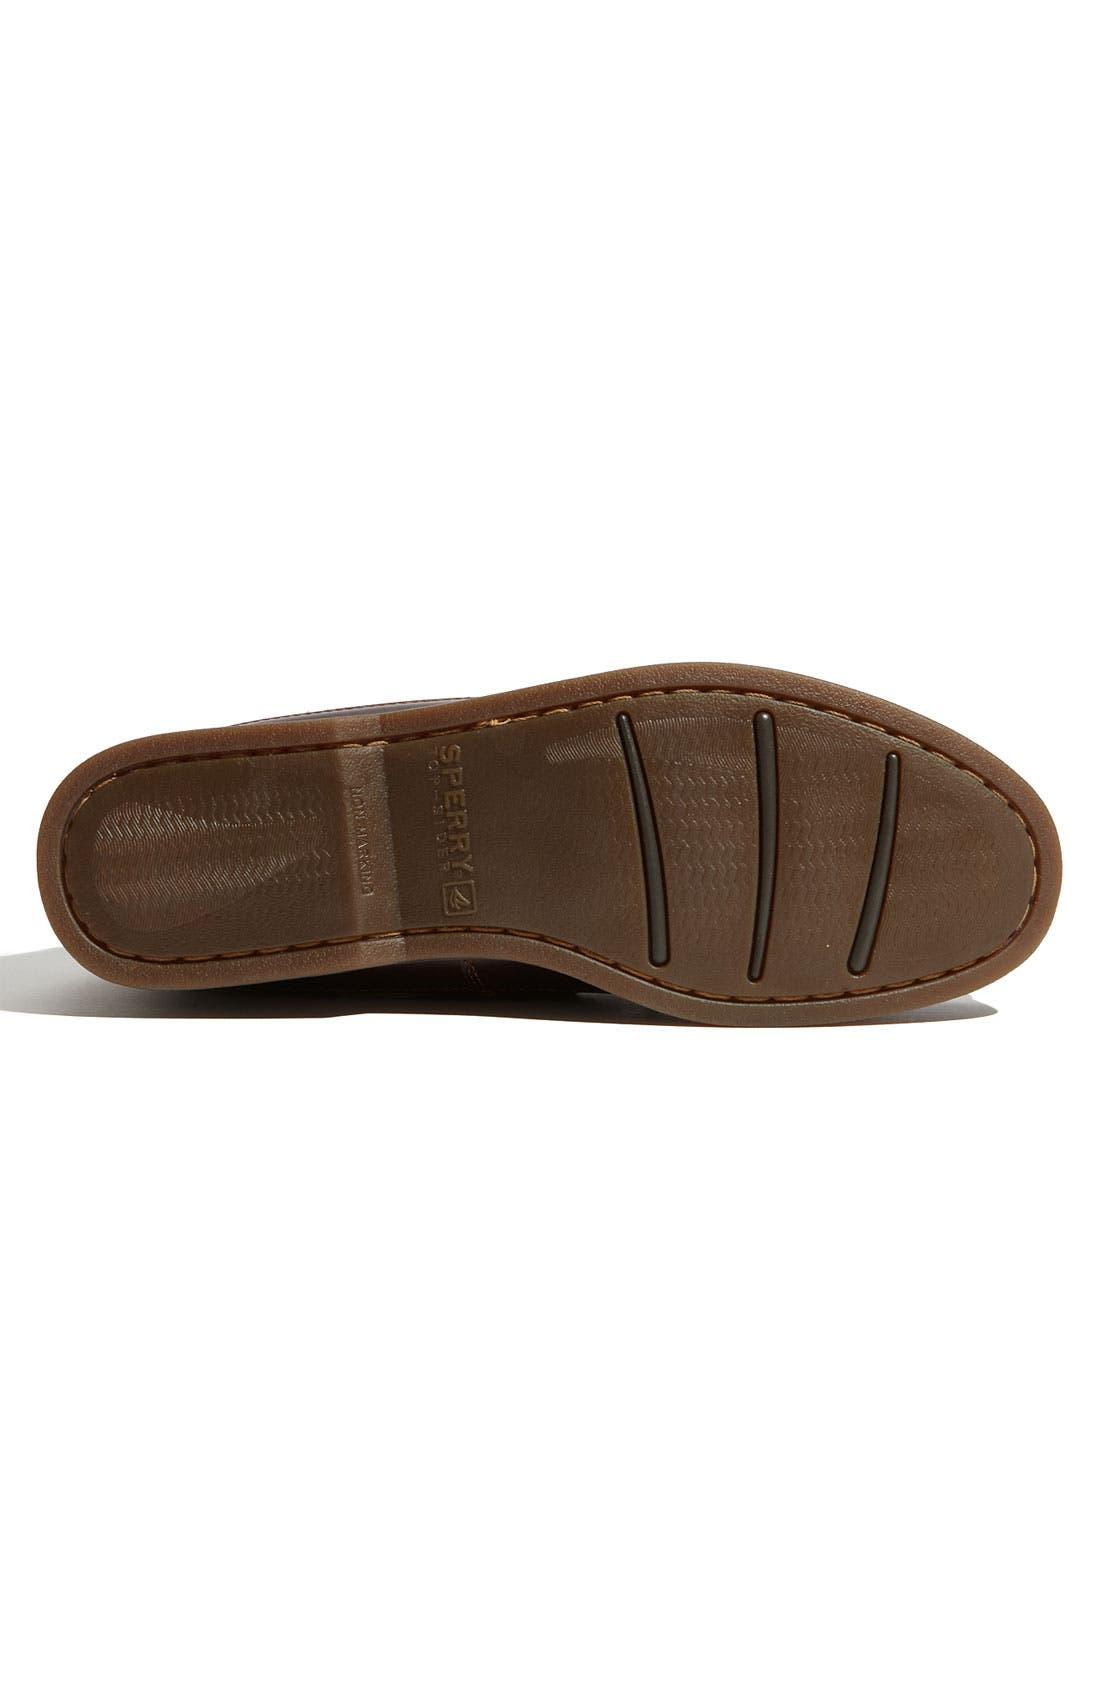 Top-Sider<sup>®</sup> 'Mako Two-Eye Canoe Moc' Boat Shoe,                             Alternate thumbnail 4, color,                             Dark Brown